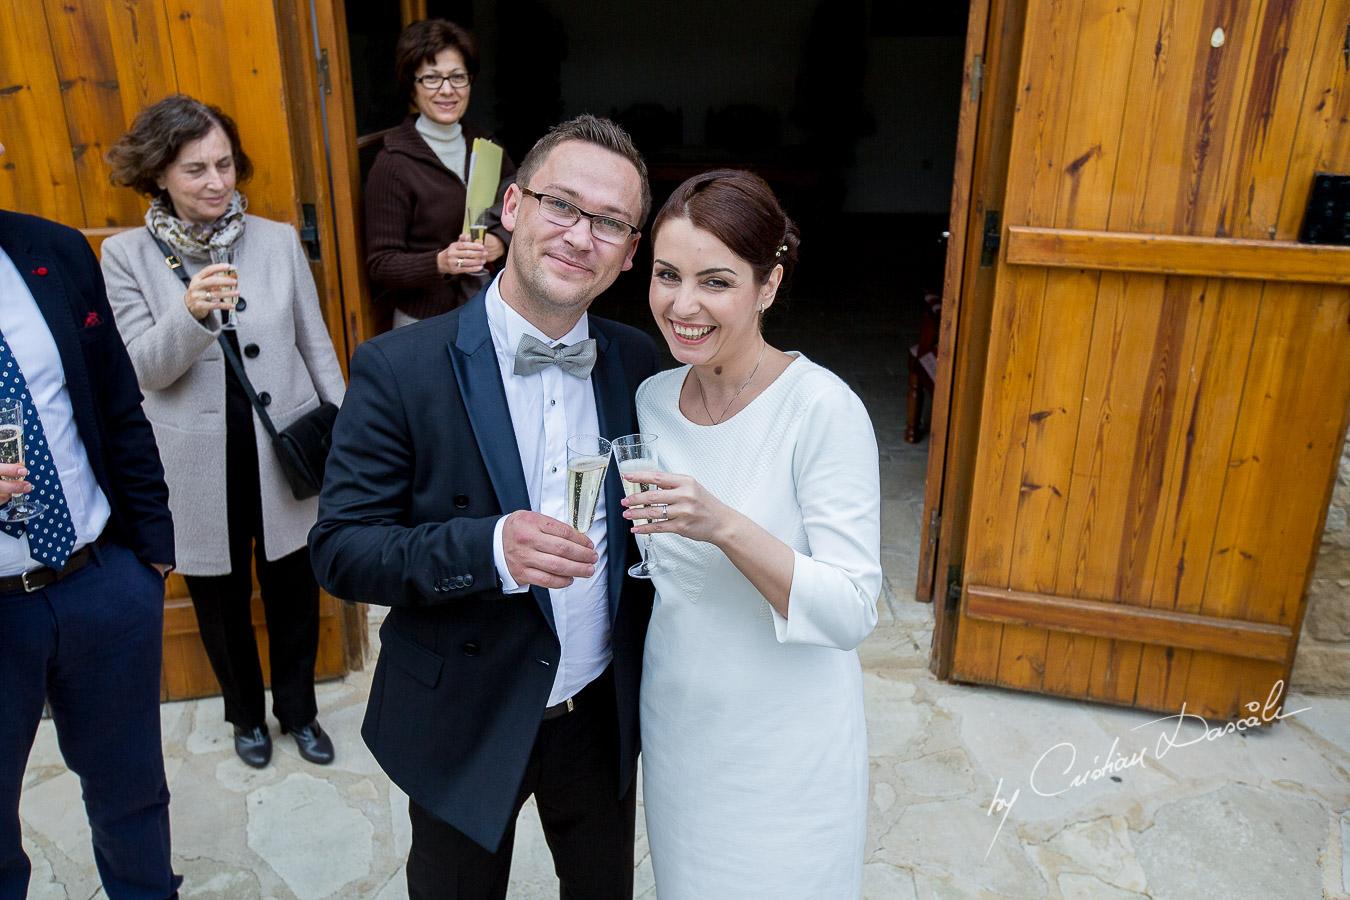 Simple Marriage Ceremony - Irina & Dragos 12